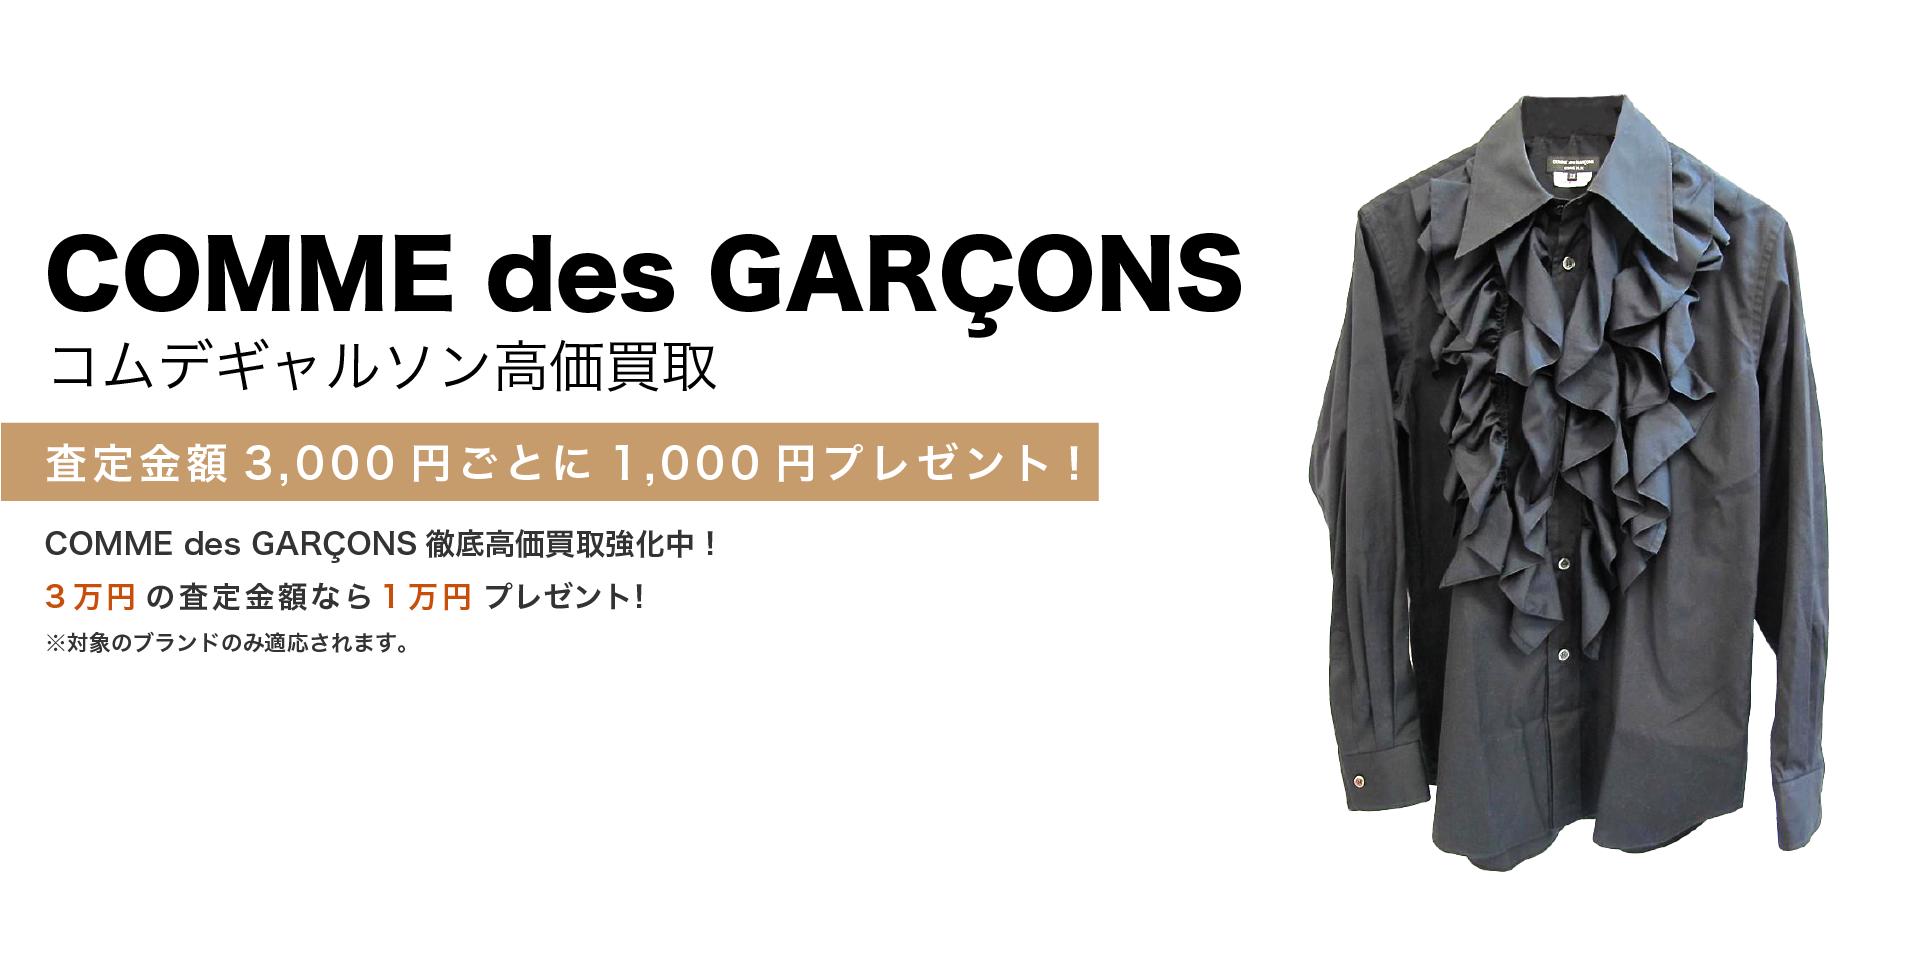 COMME des GARCONSのキービジュアル